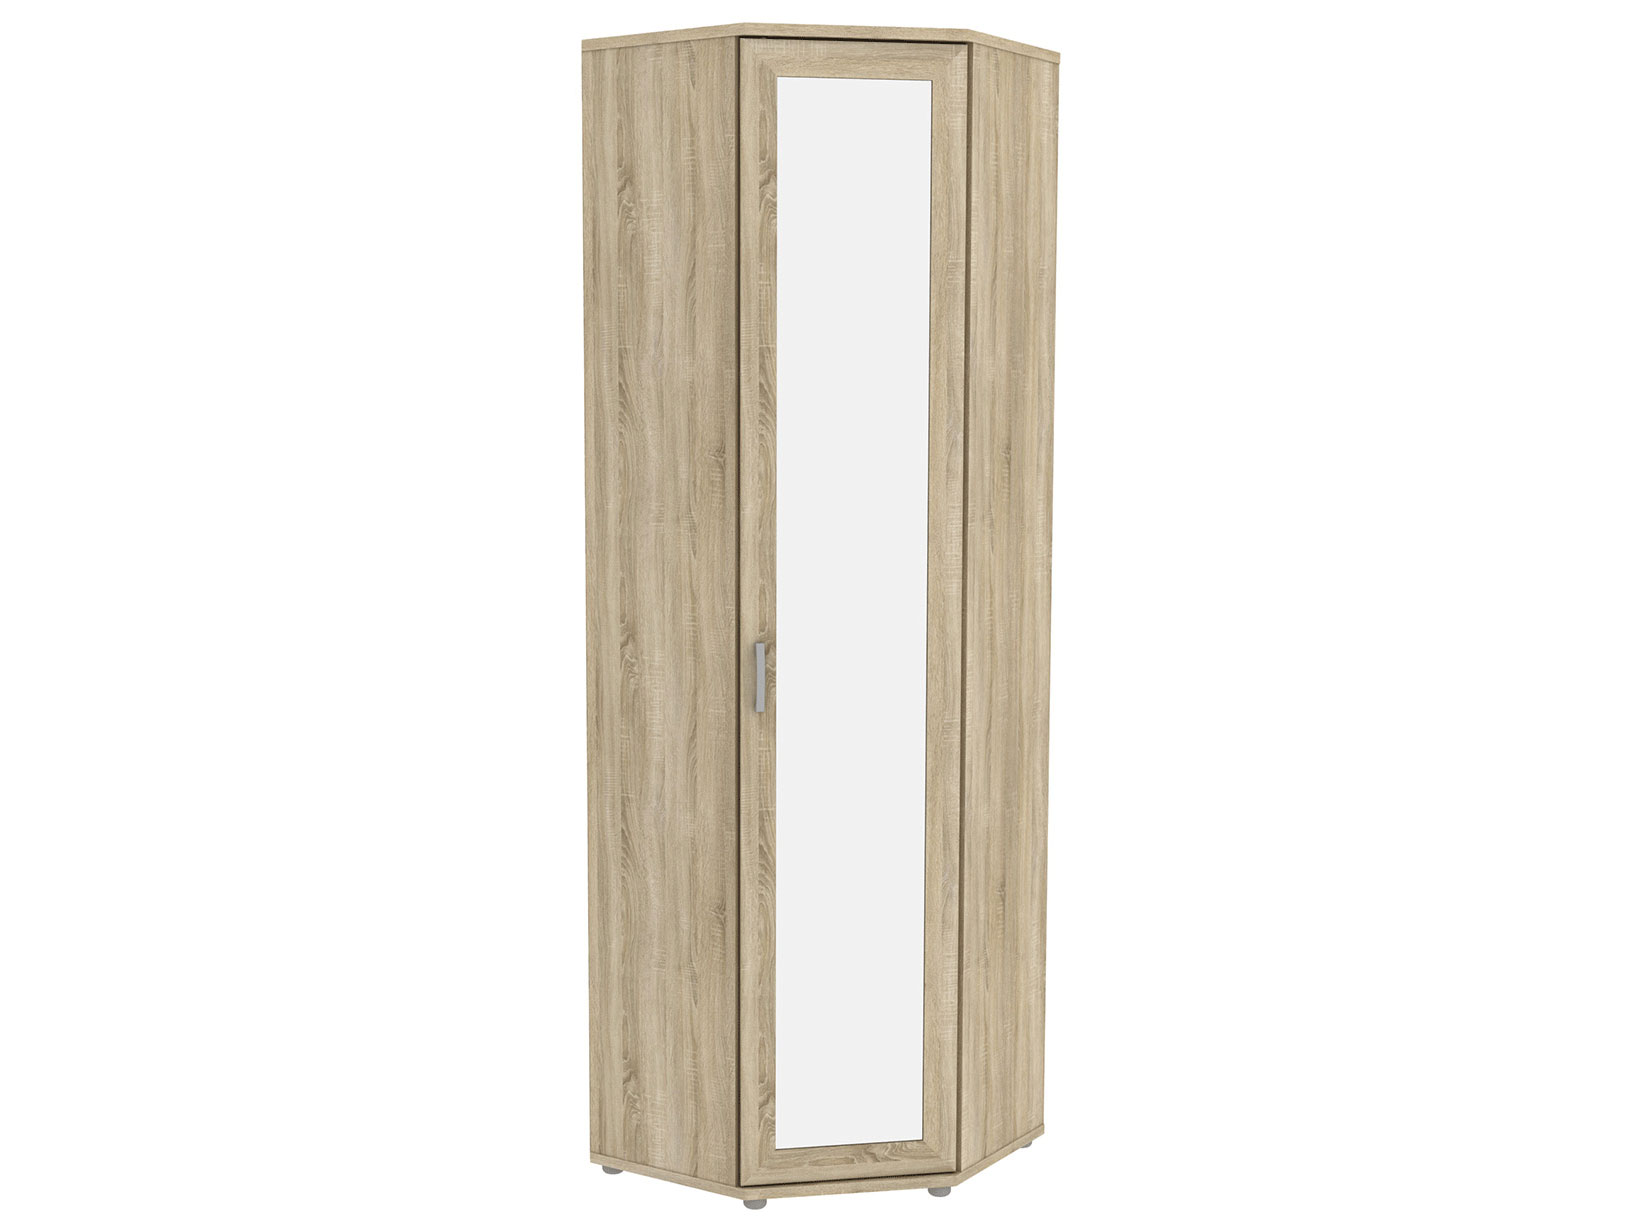 Распашной шкаф Леонардо